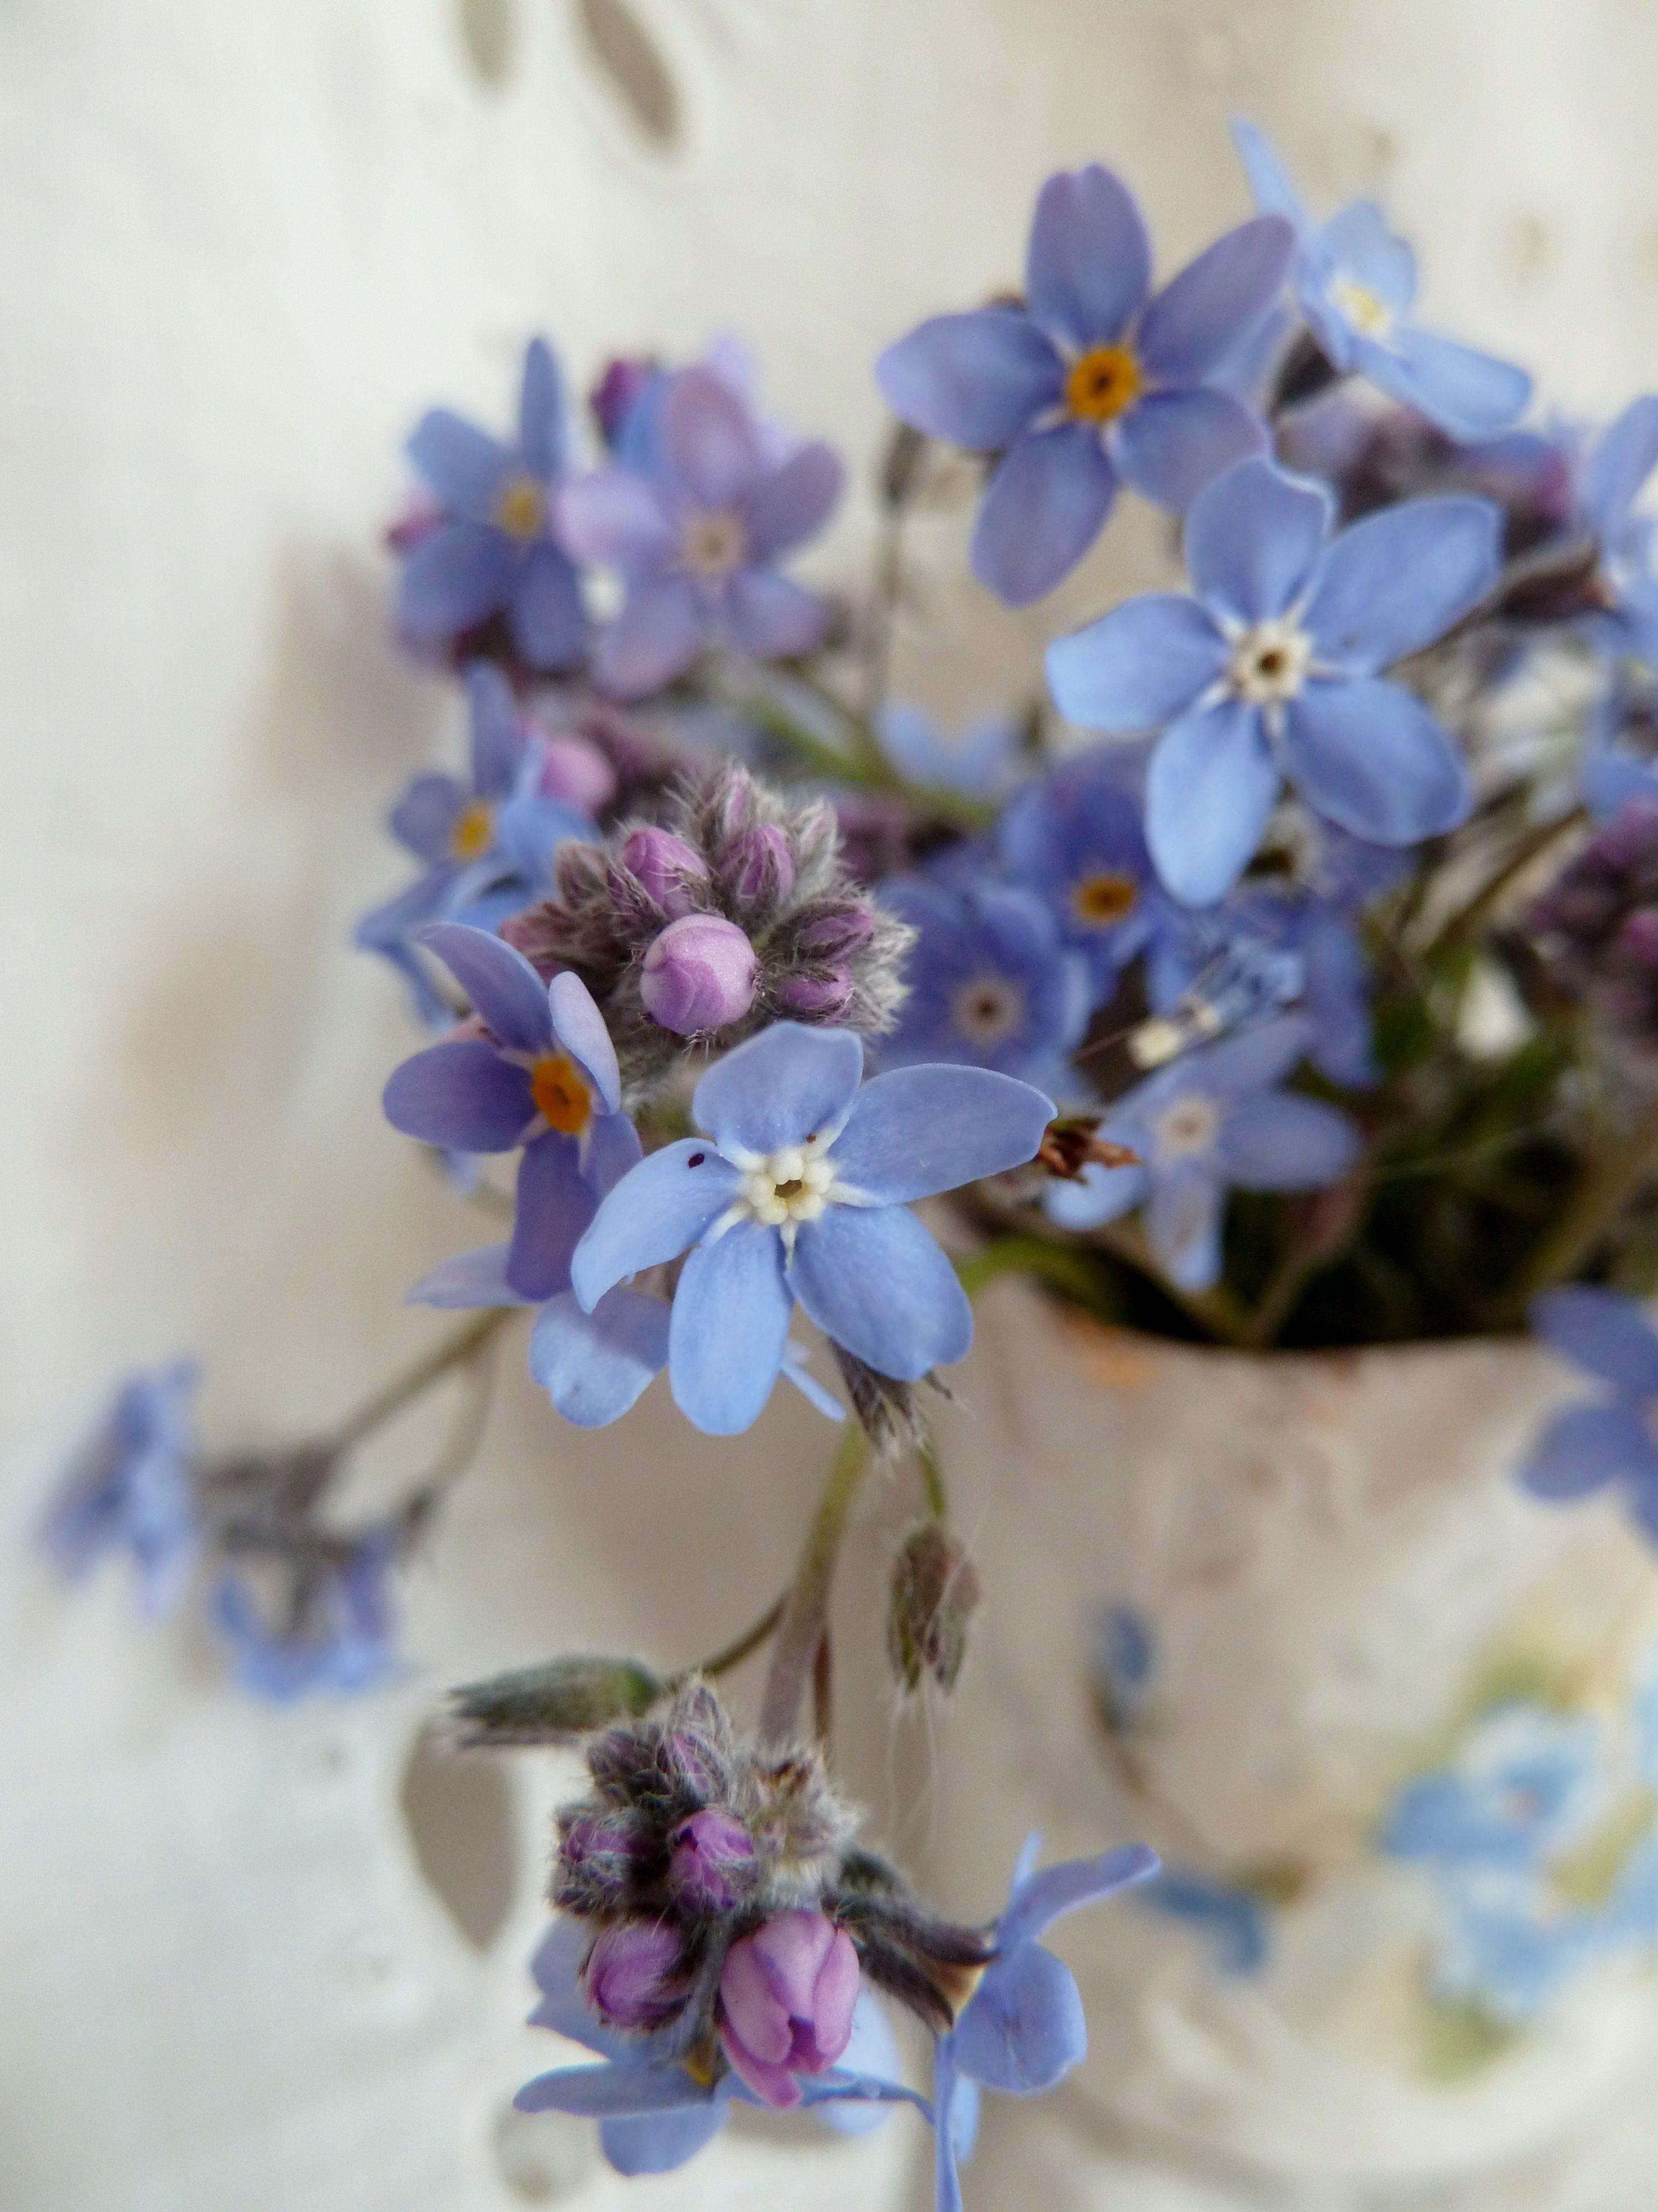 Bouquet de myosotis sylvatica Woodland For me not